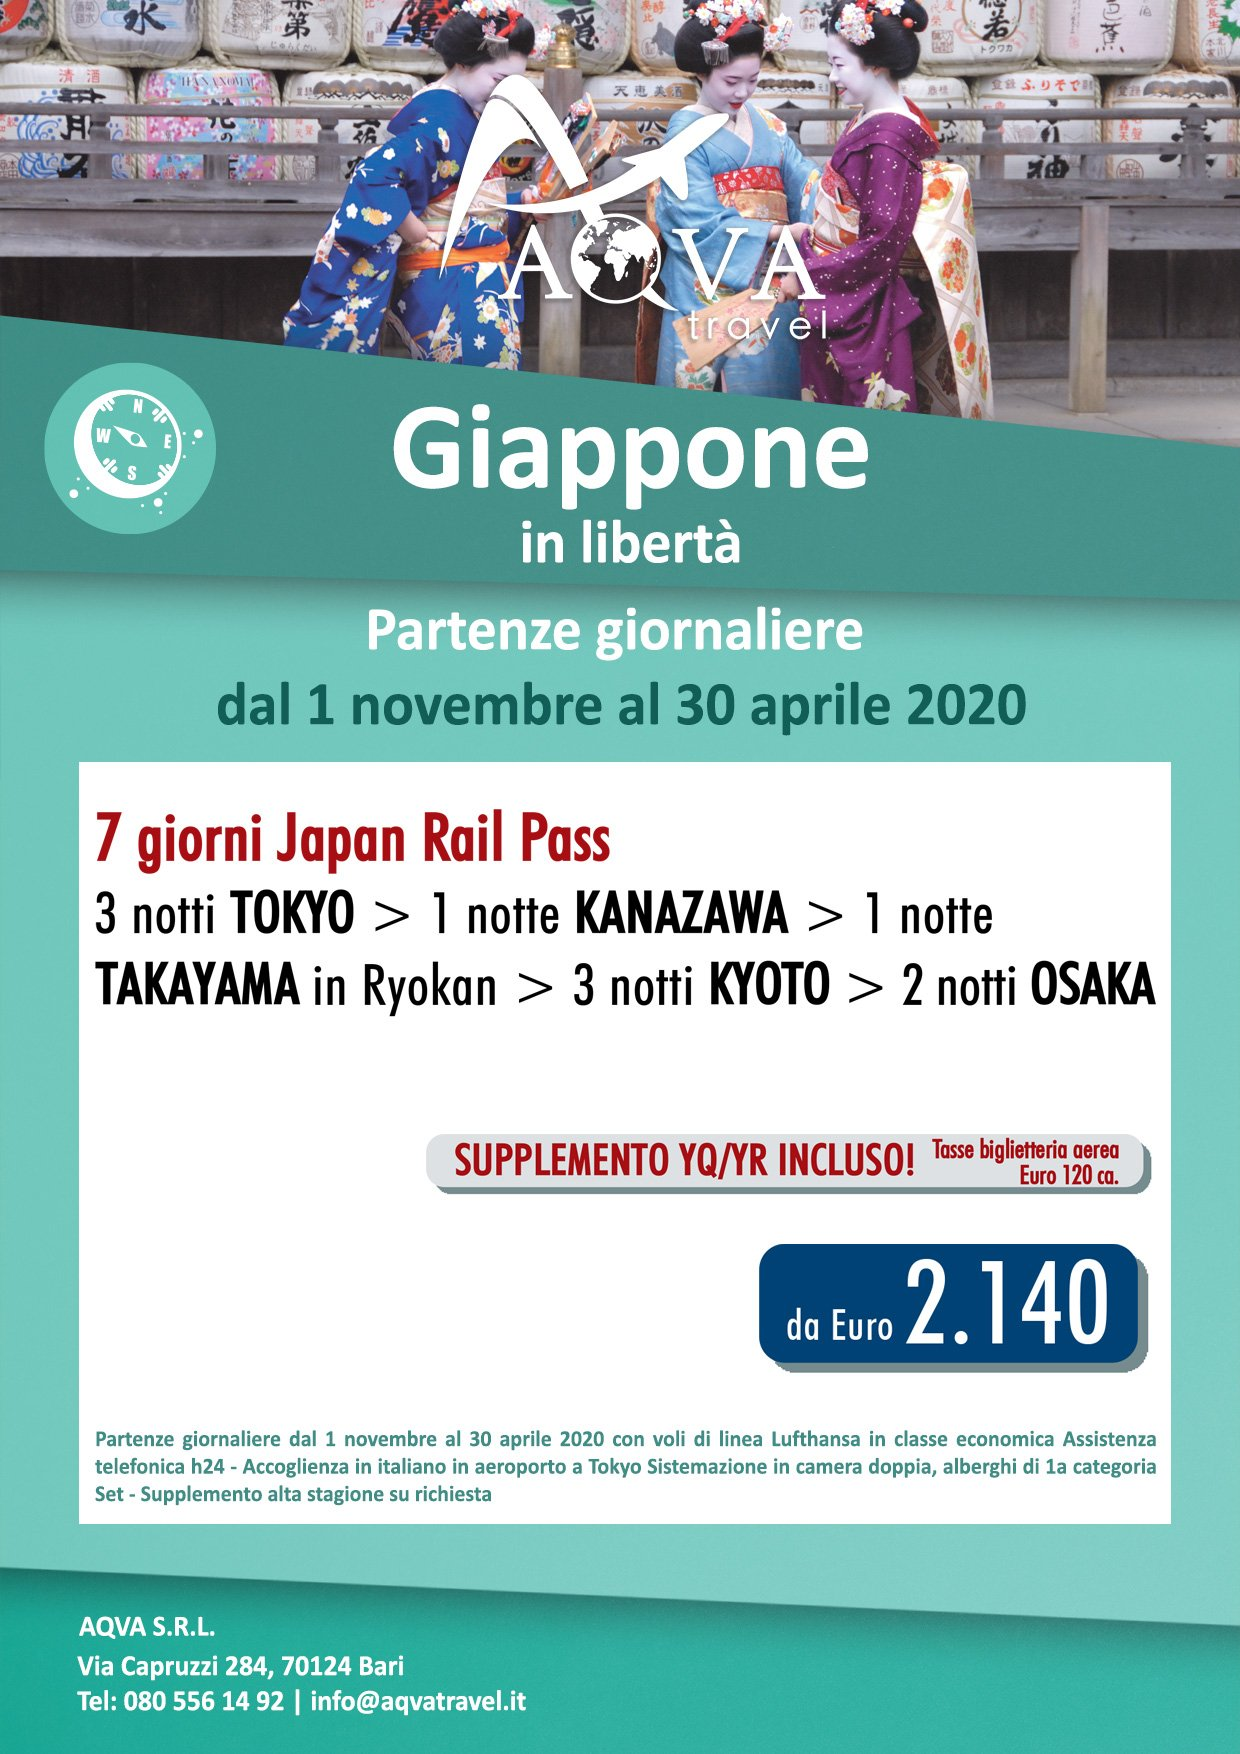 Giappone-in-libertà-offerte-agenzia-di-viaggi-Bari-AQVATRAVEL-it